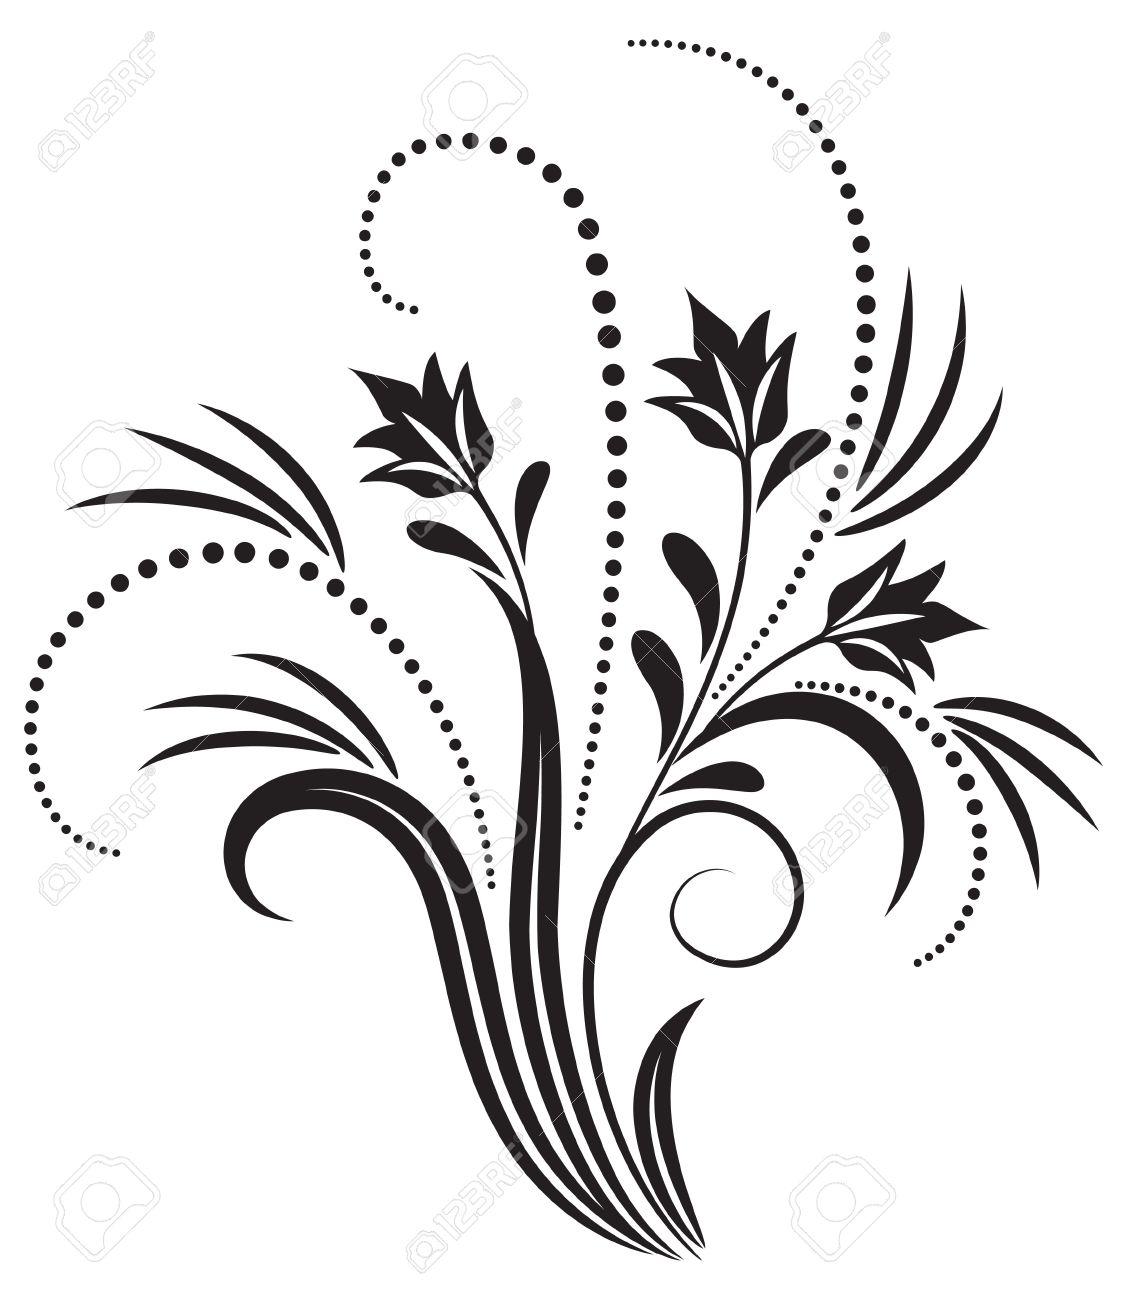 Decorative ornament for various design artwork Stock Vector - 10253752